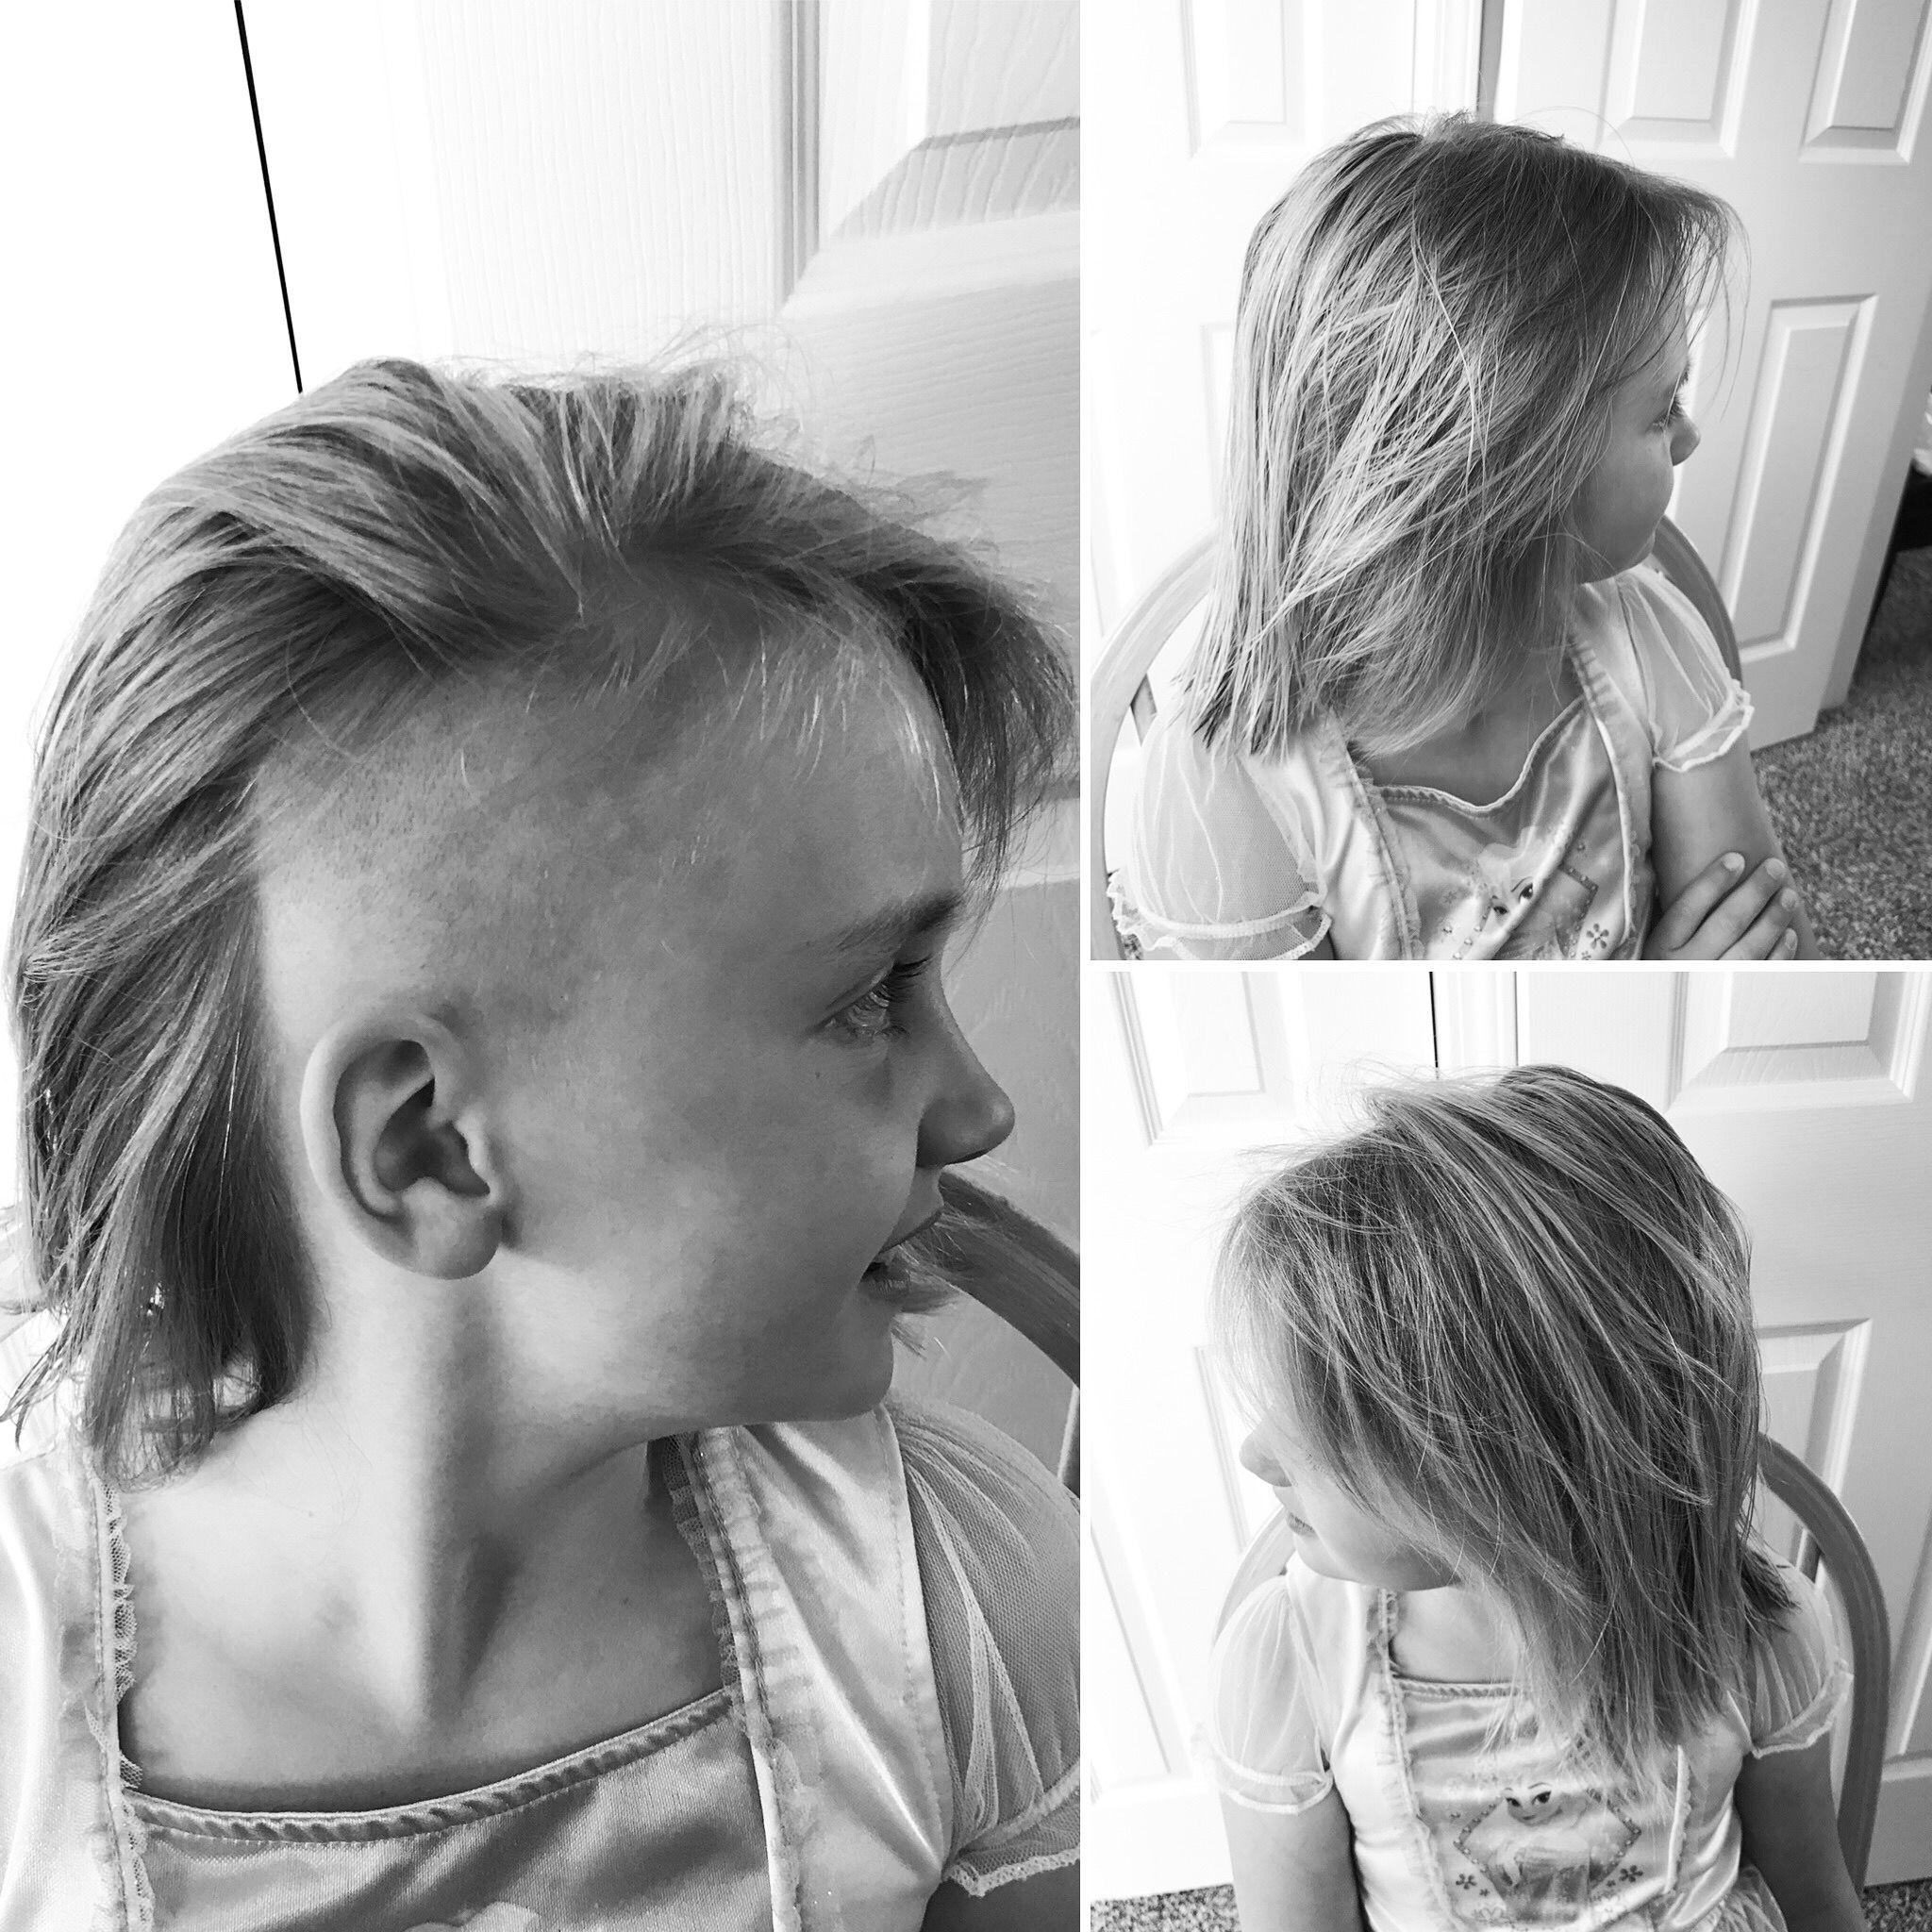 Undercut Hair Haircut Girls Hairstyle Diy Kitchen Beautician Summer Hair 2017 Try It Cool Kid Hair Cool Ha Girls Shaved Hairstyles Girl Haircuts Diy Hairstyles